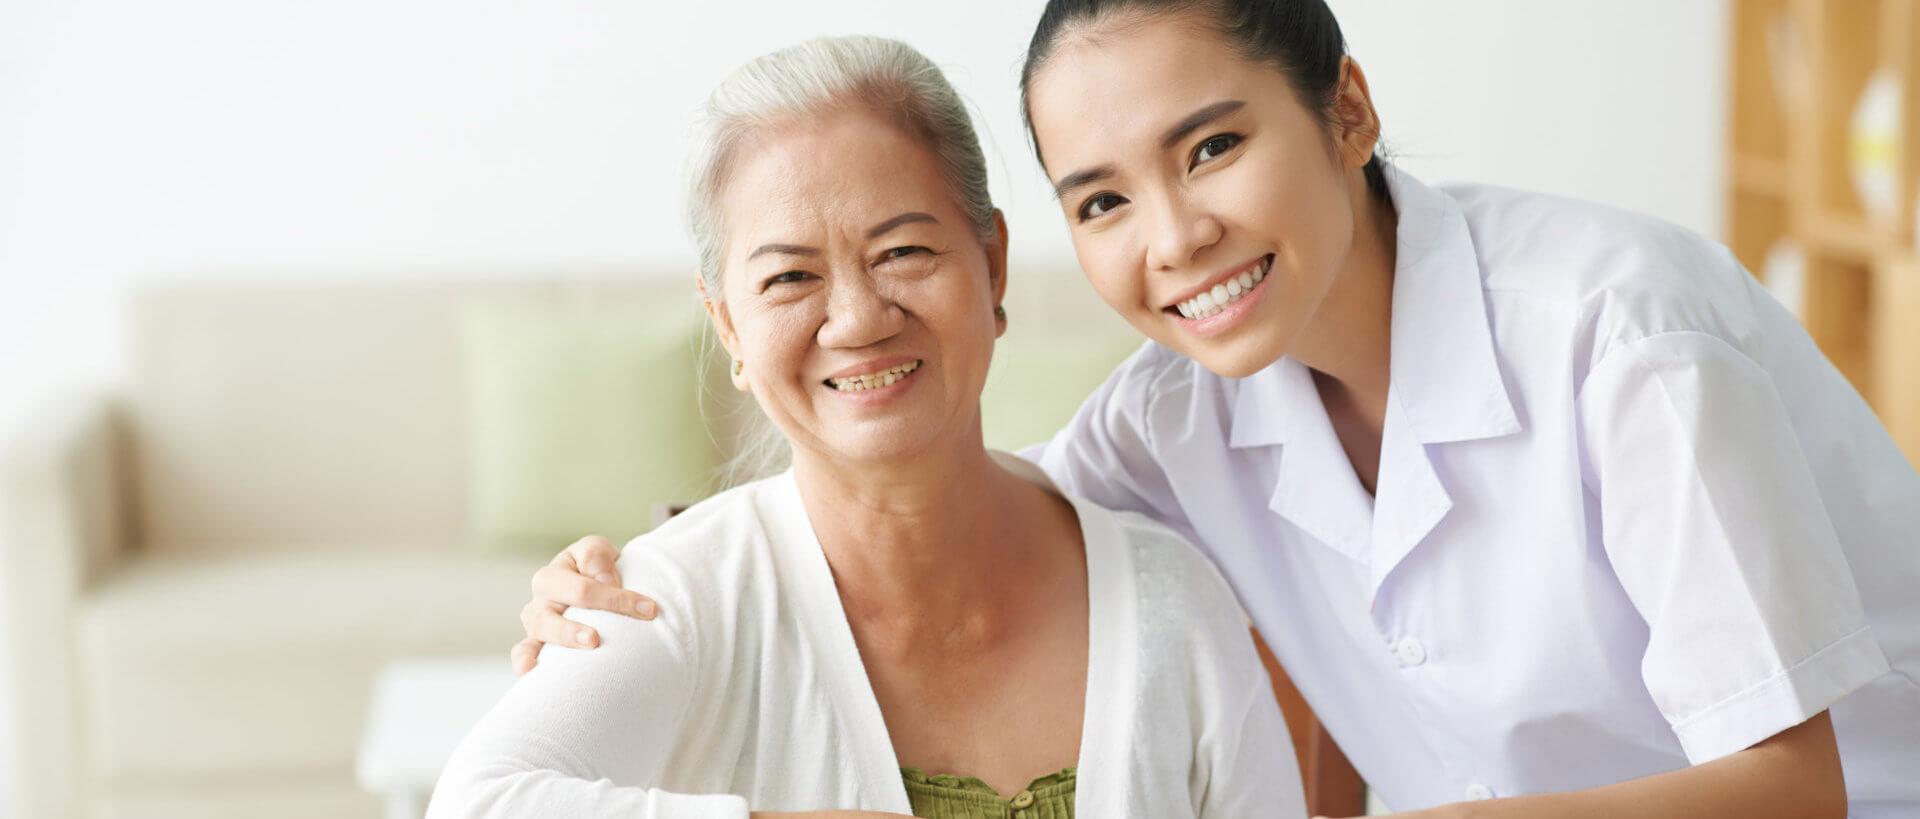 caregiver holding senior woman